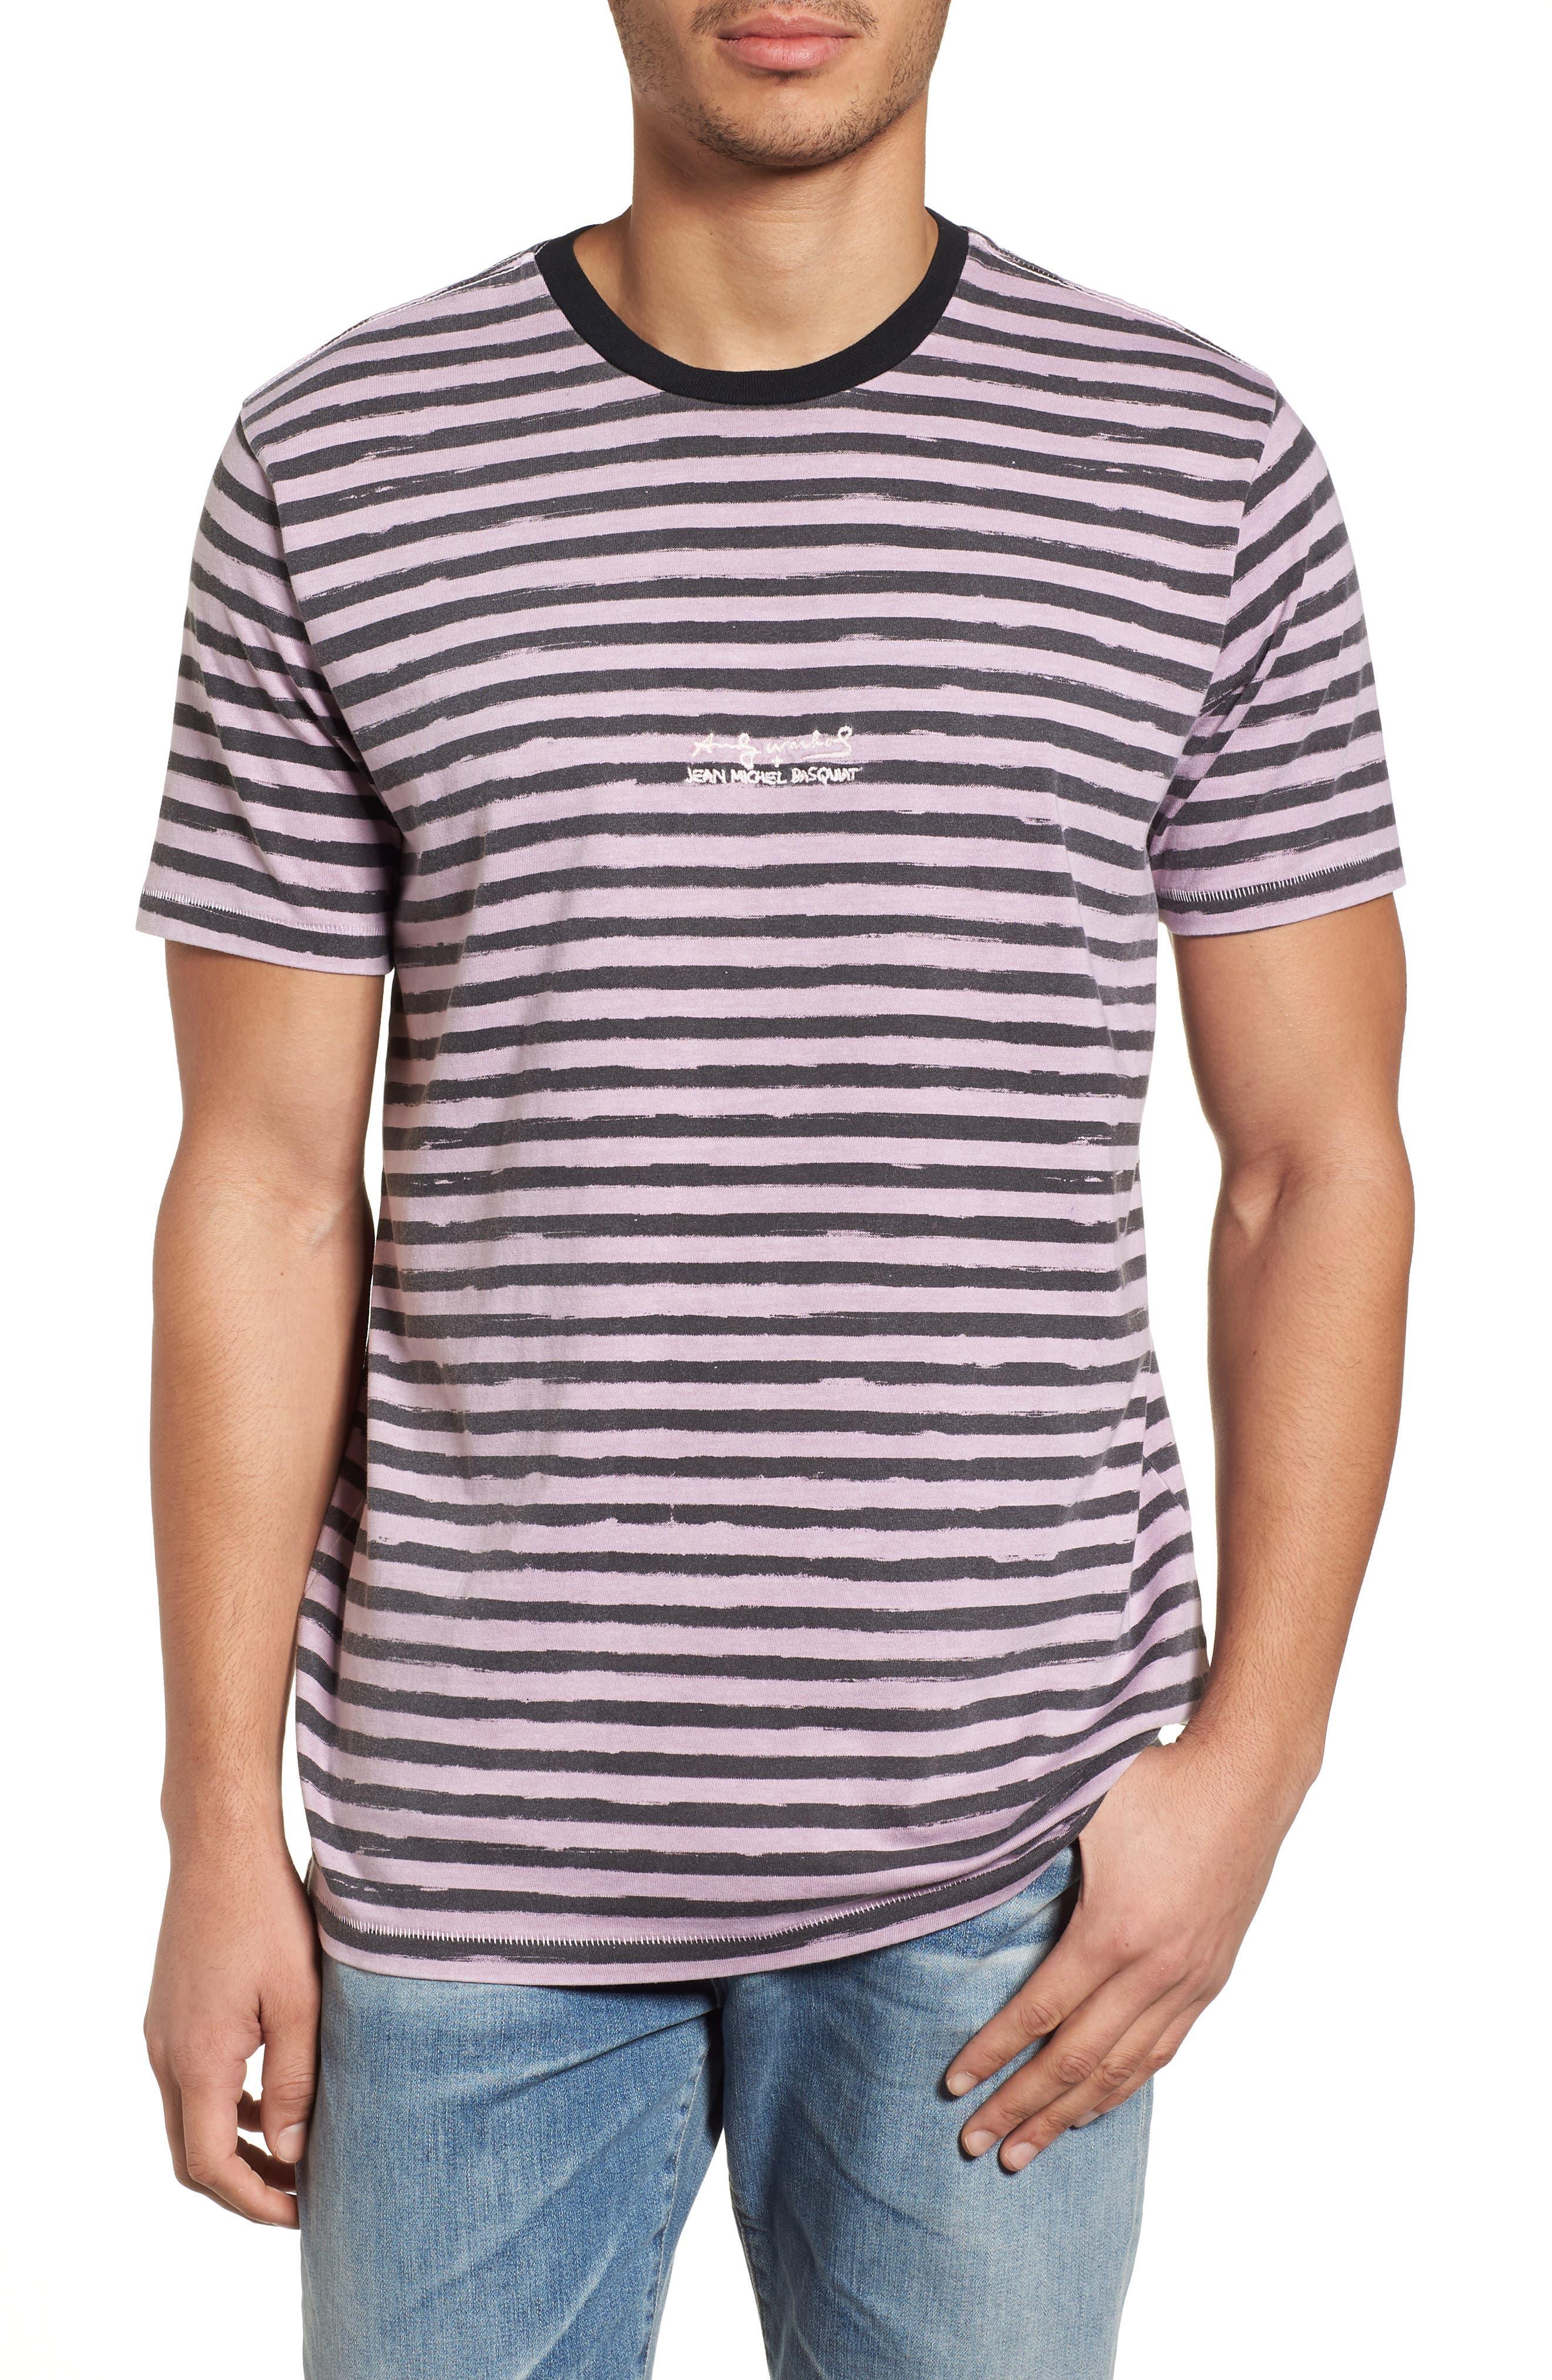 x Warhol Epi T-Shirt,                         Main,                         color,